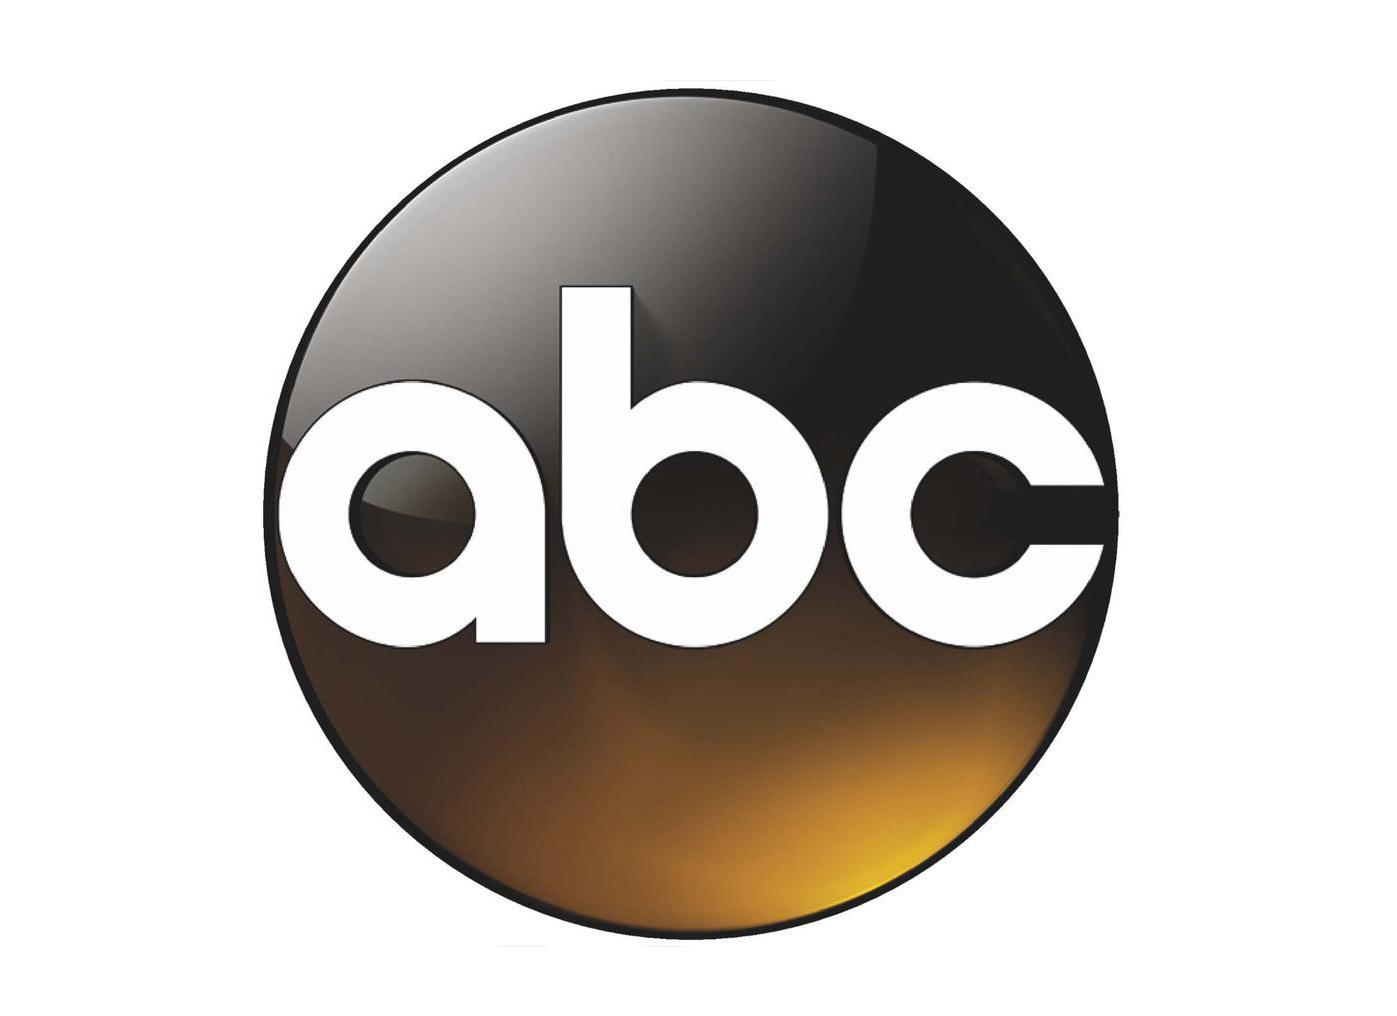 ABC.jpg